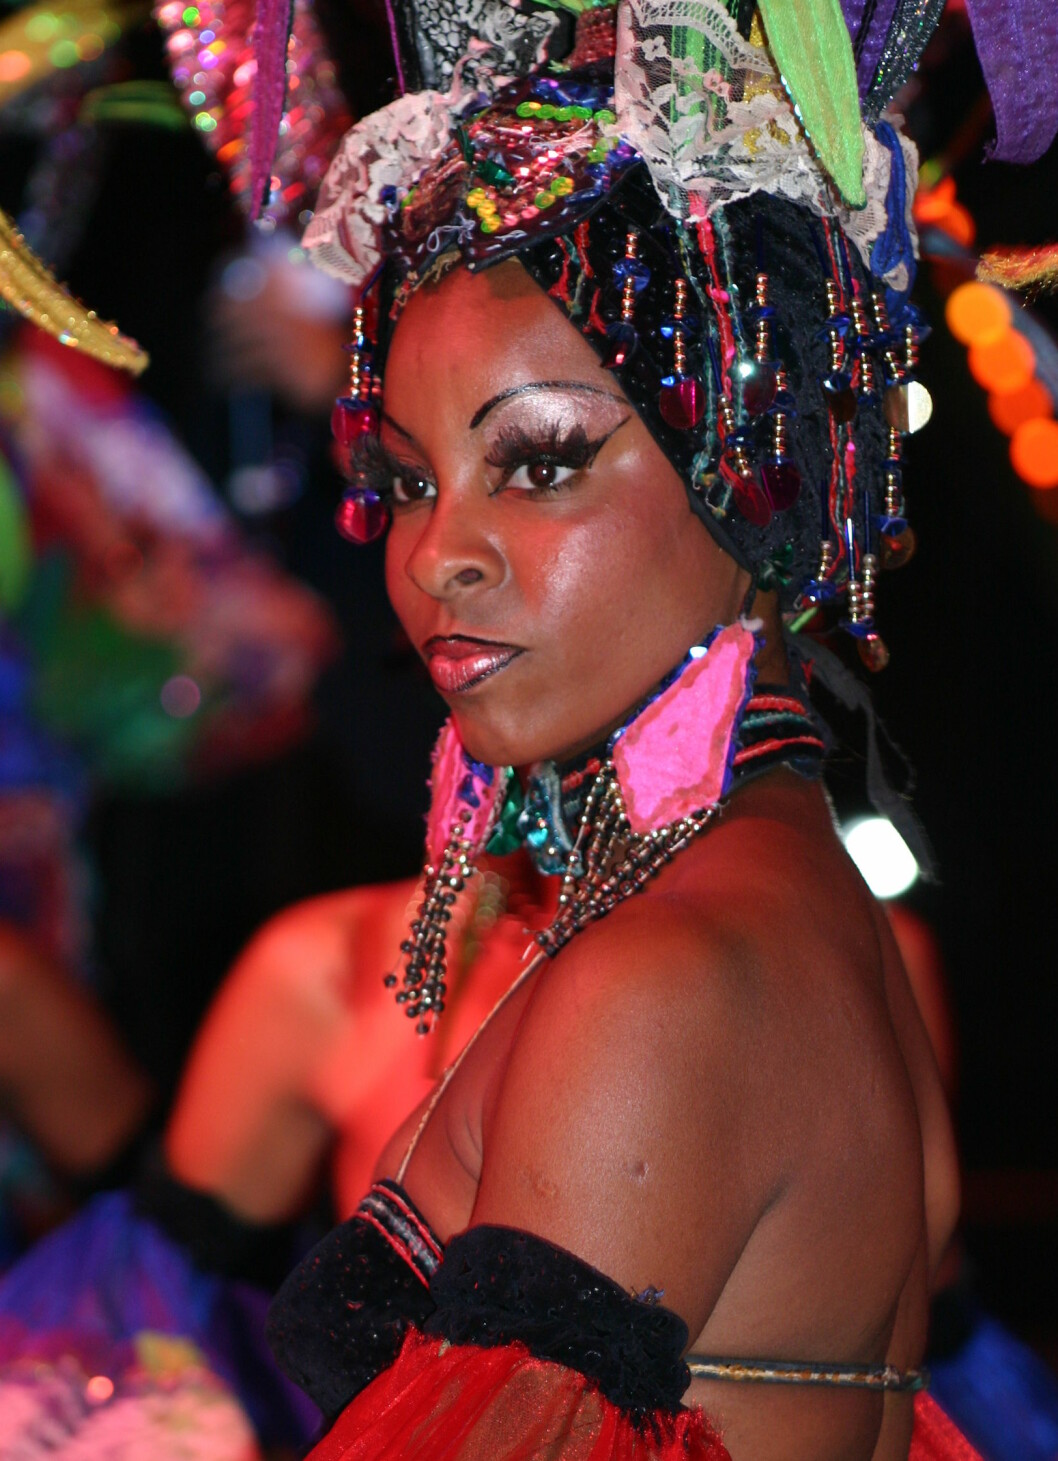 <strong>Tropicana show:</strong> Samba, salsa og sigar. Foto: Tove Andersson